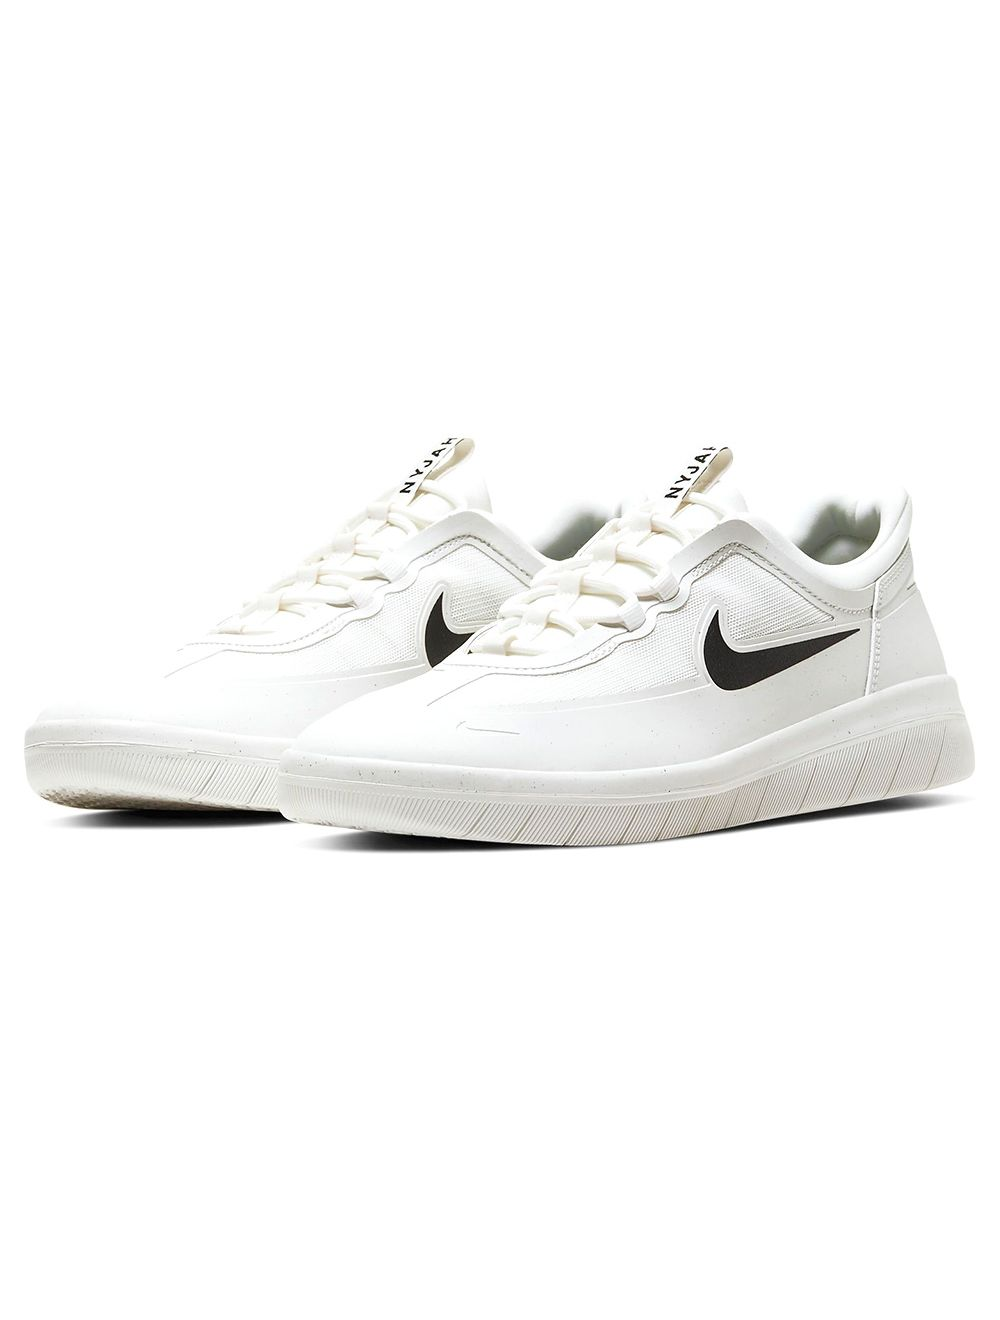 Nike SB. Nyjah Free 2. Summit White / Summit White / Black.